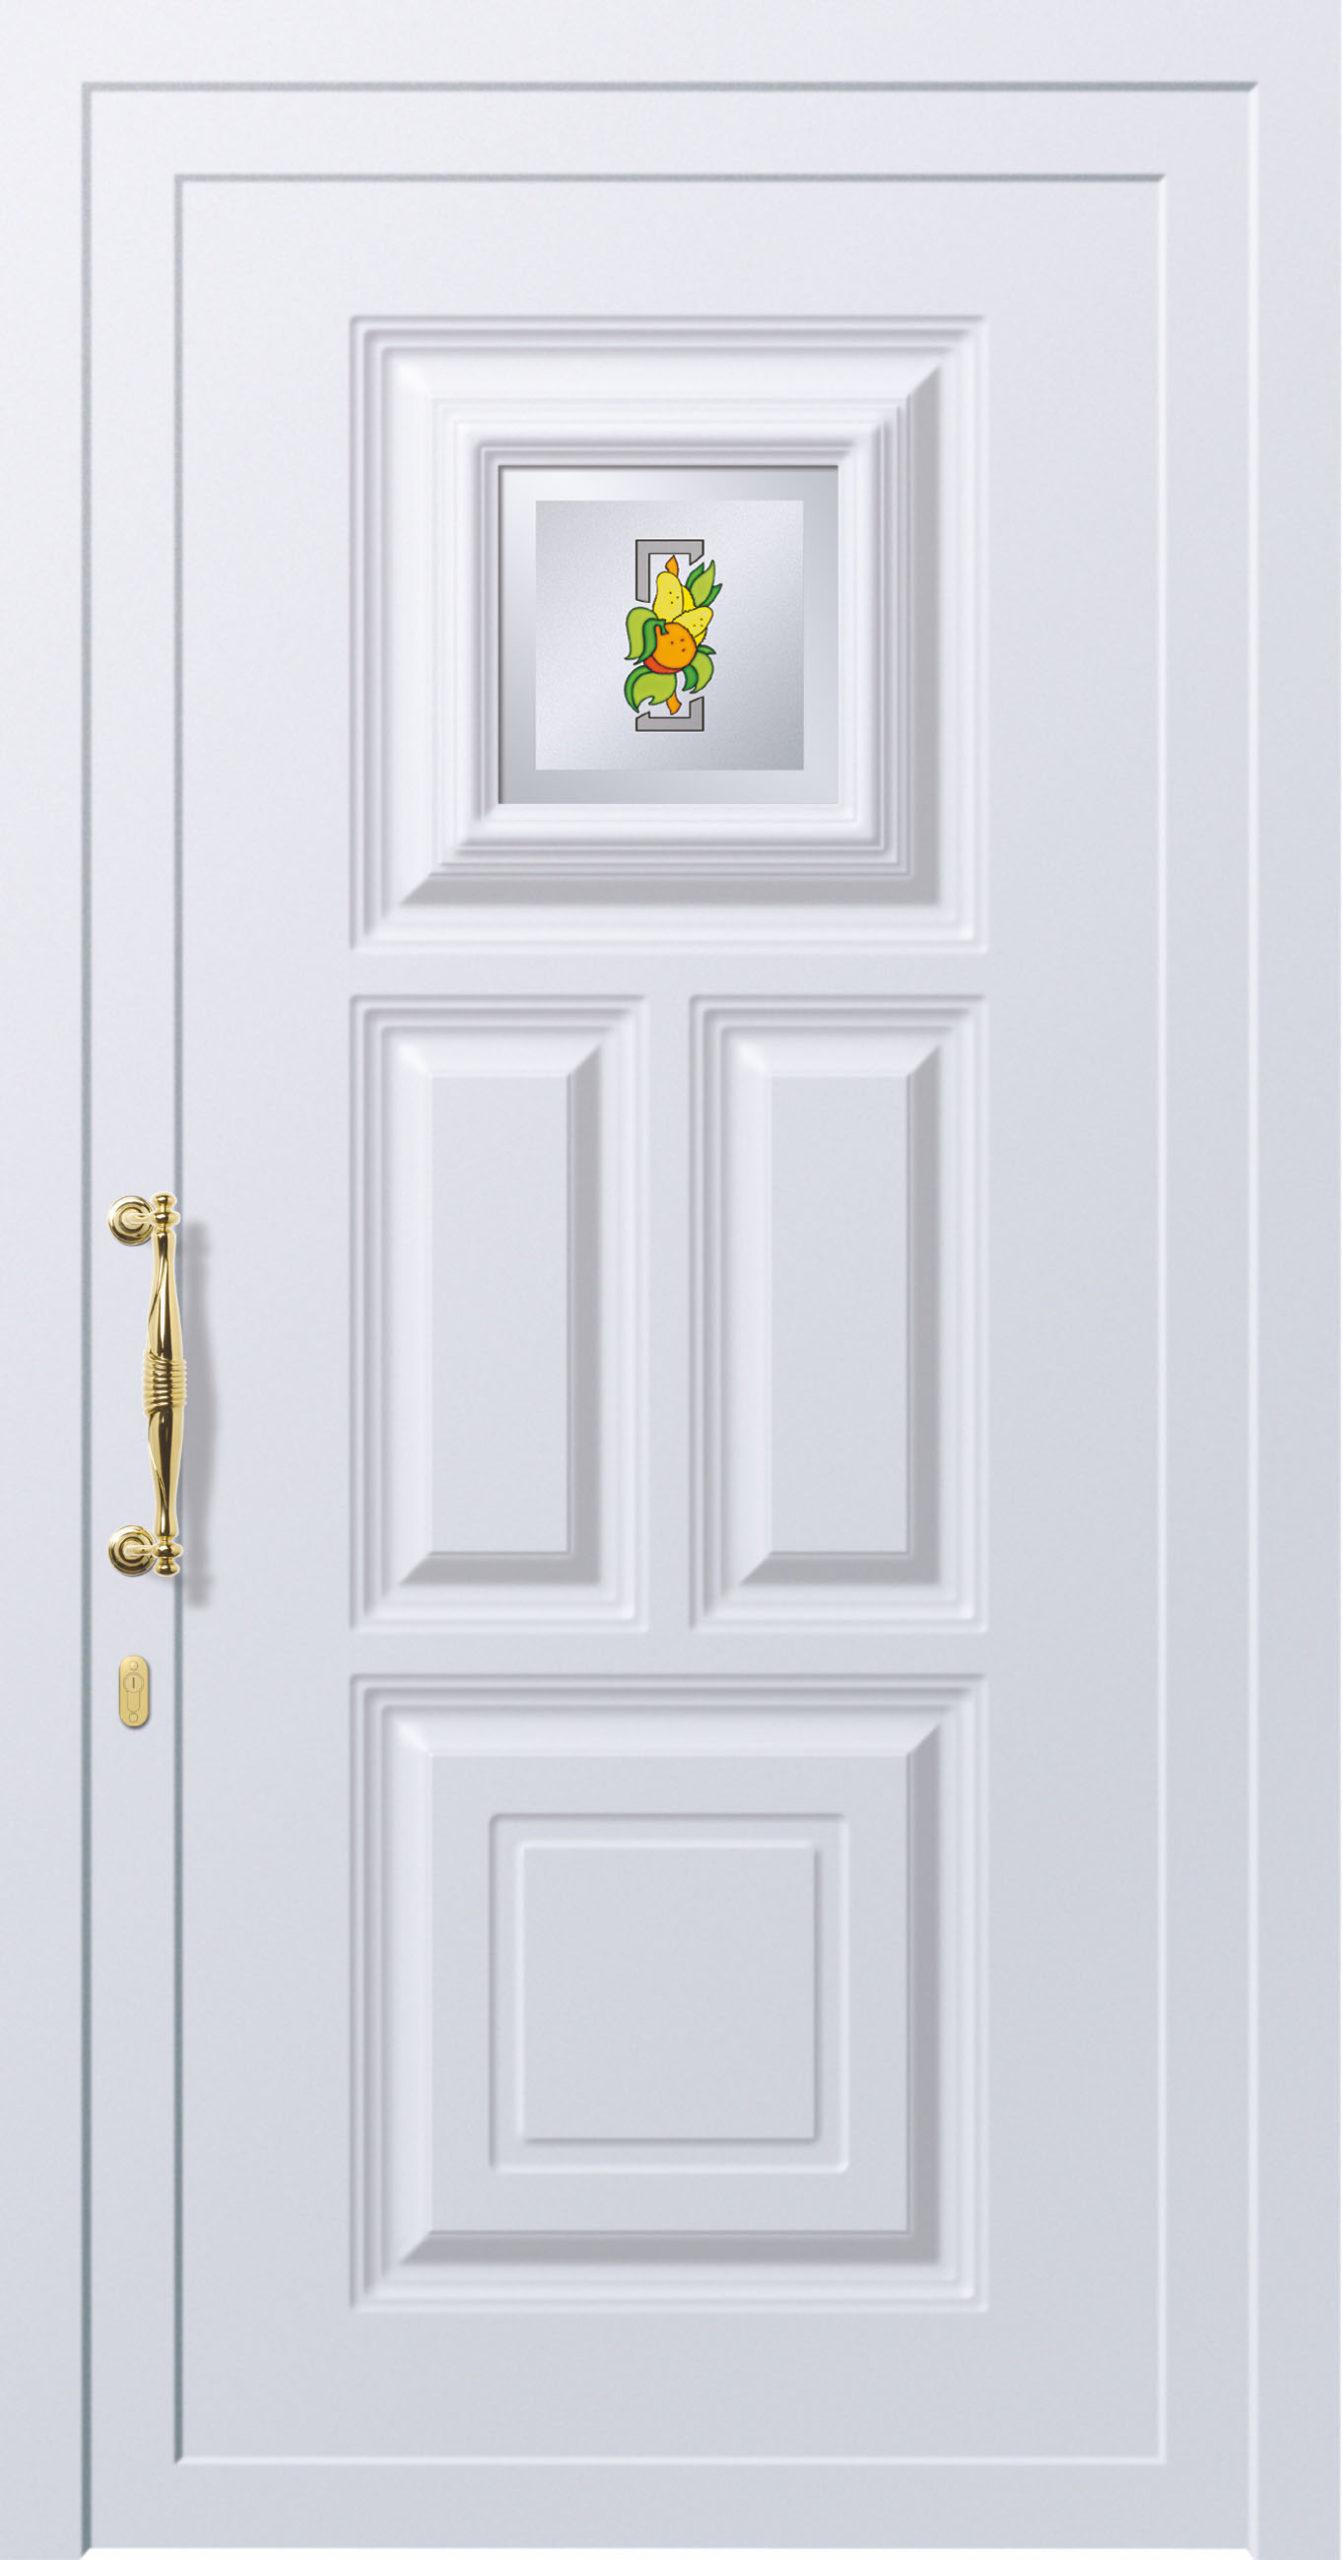 Entry Doors Linea Classica 125